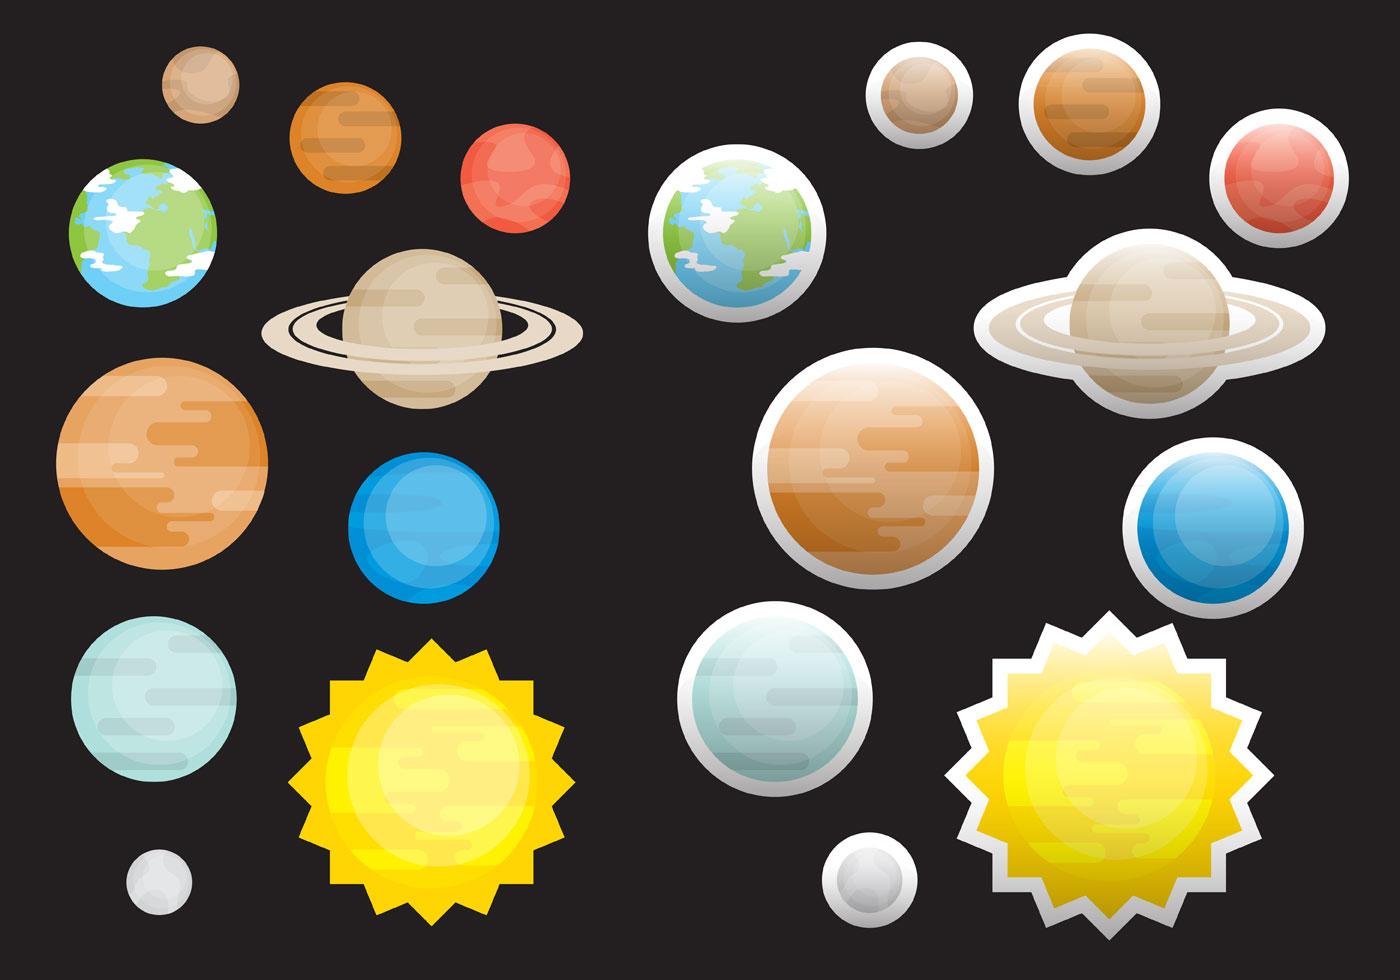 Flat Planet Vectors Download Free Vector Art Stock